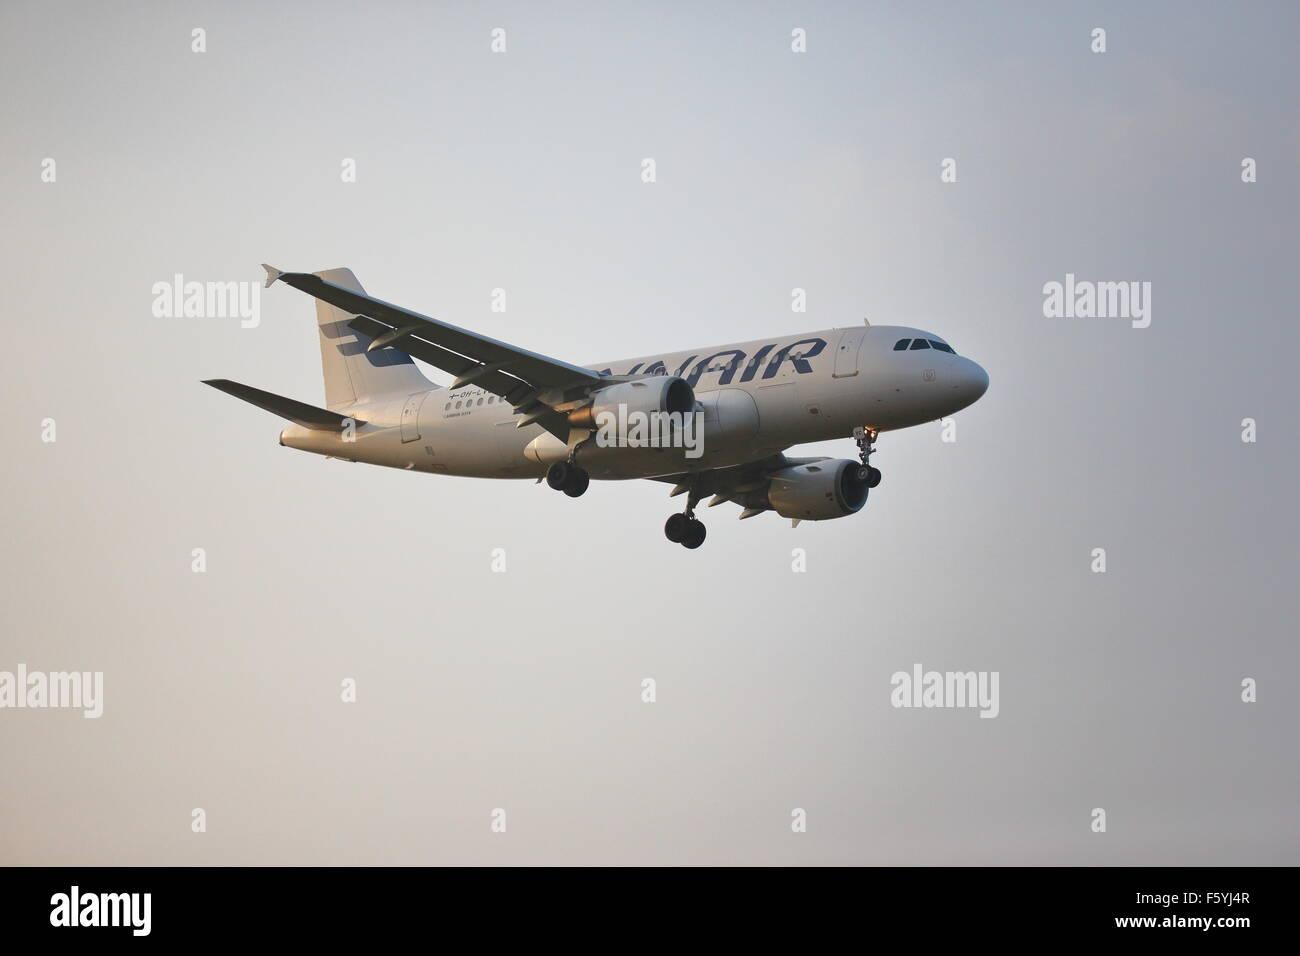 Finnair Airbus A319-112 OH-LVC landing at Heathrow Airport, London - Stock Image